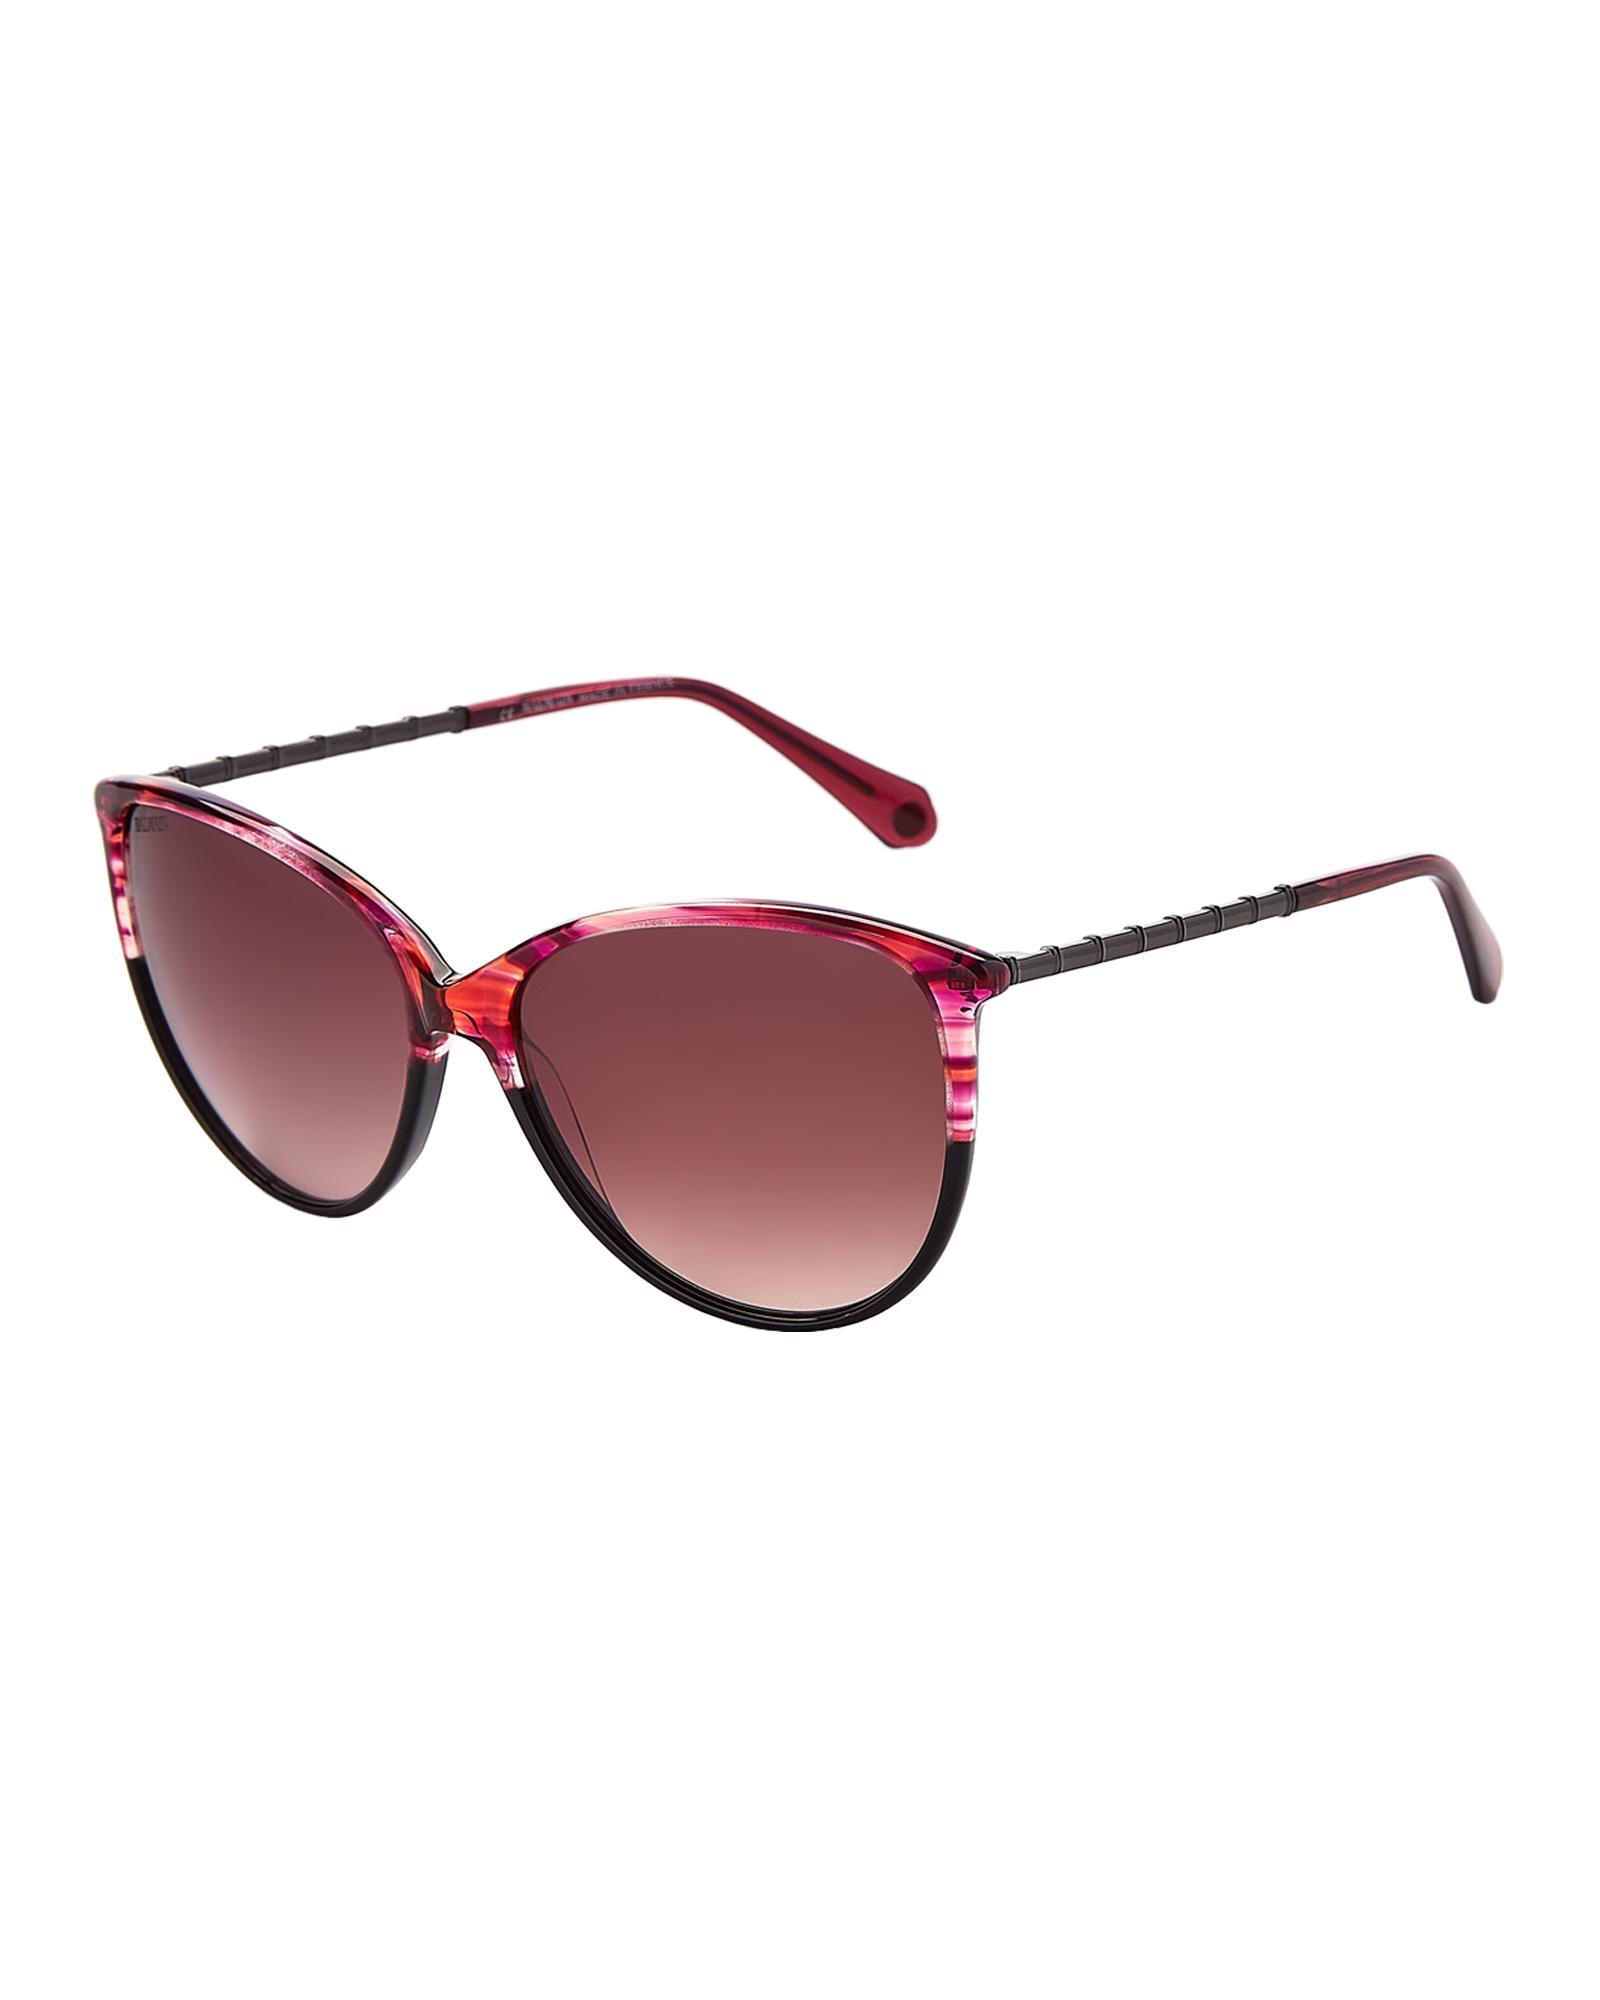 30538c8a82 Lyst - Balmain Bl2085 Purple   Black Cat Eye Sunglasses in White